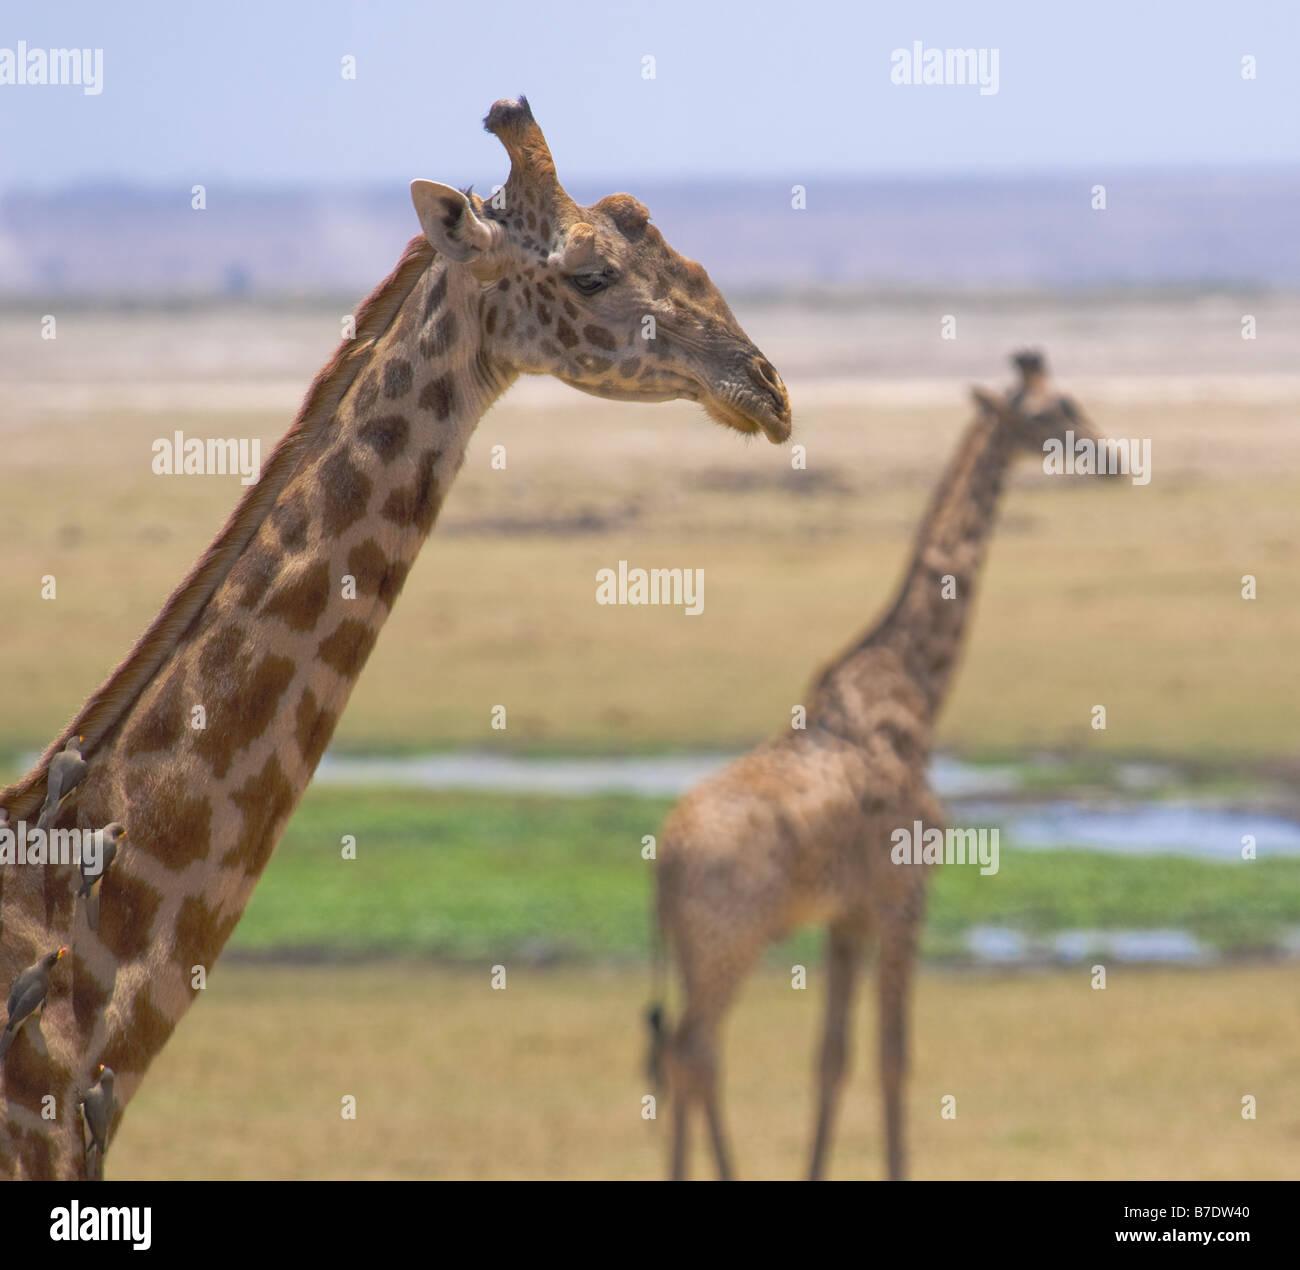 giraffes in amboseli national park kenya - Stock Image